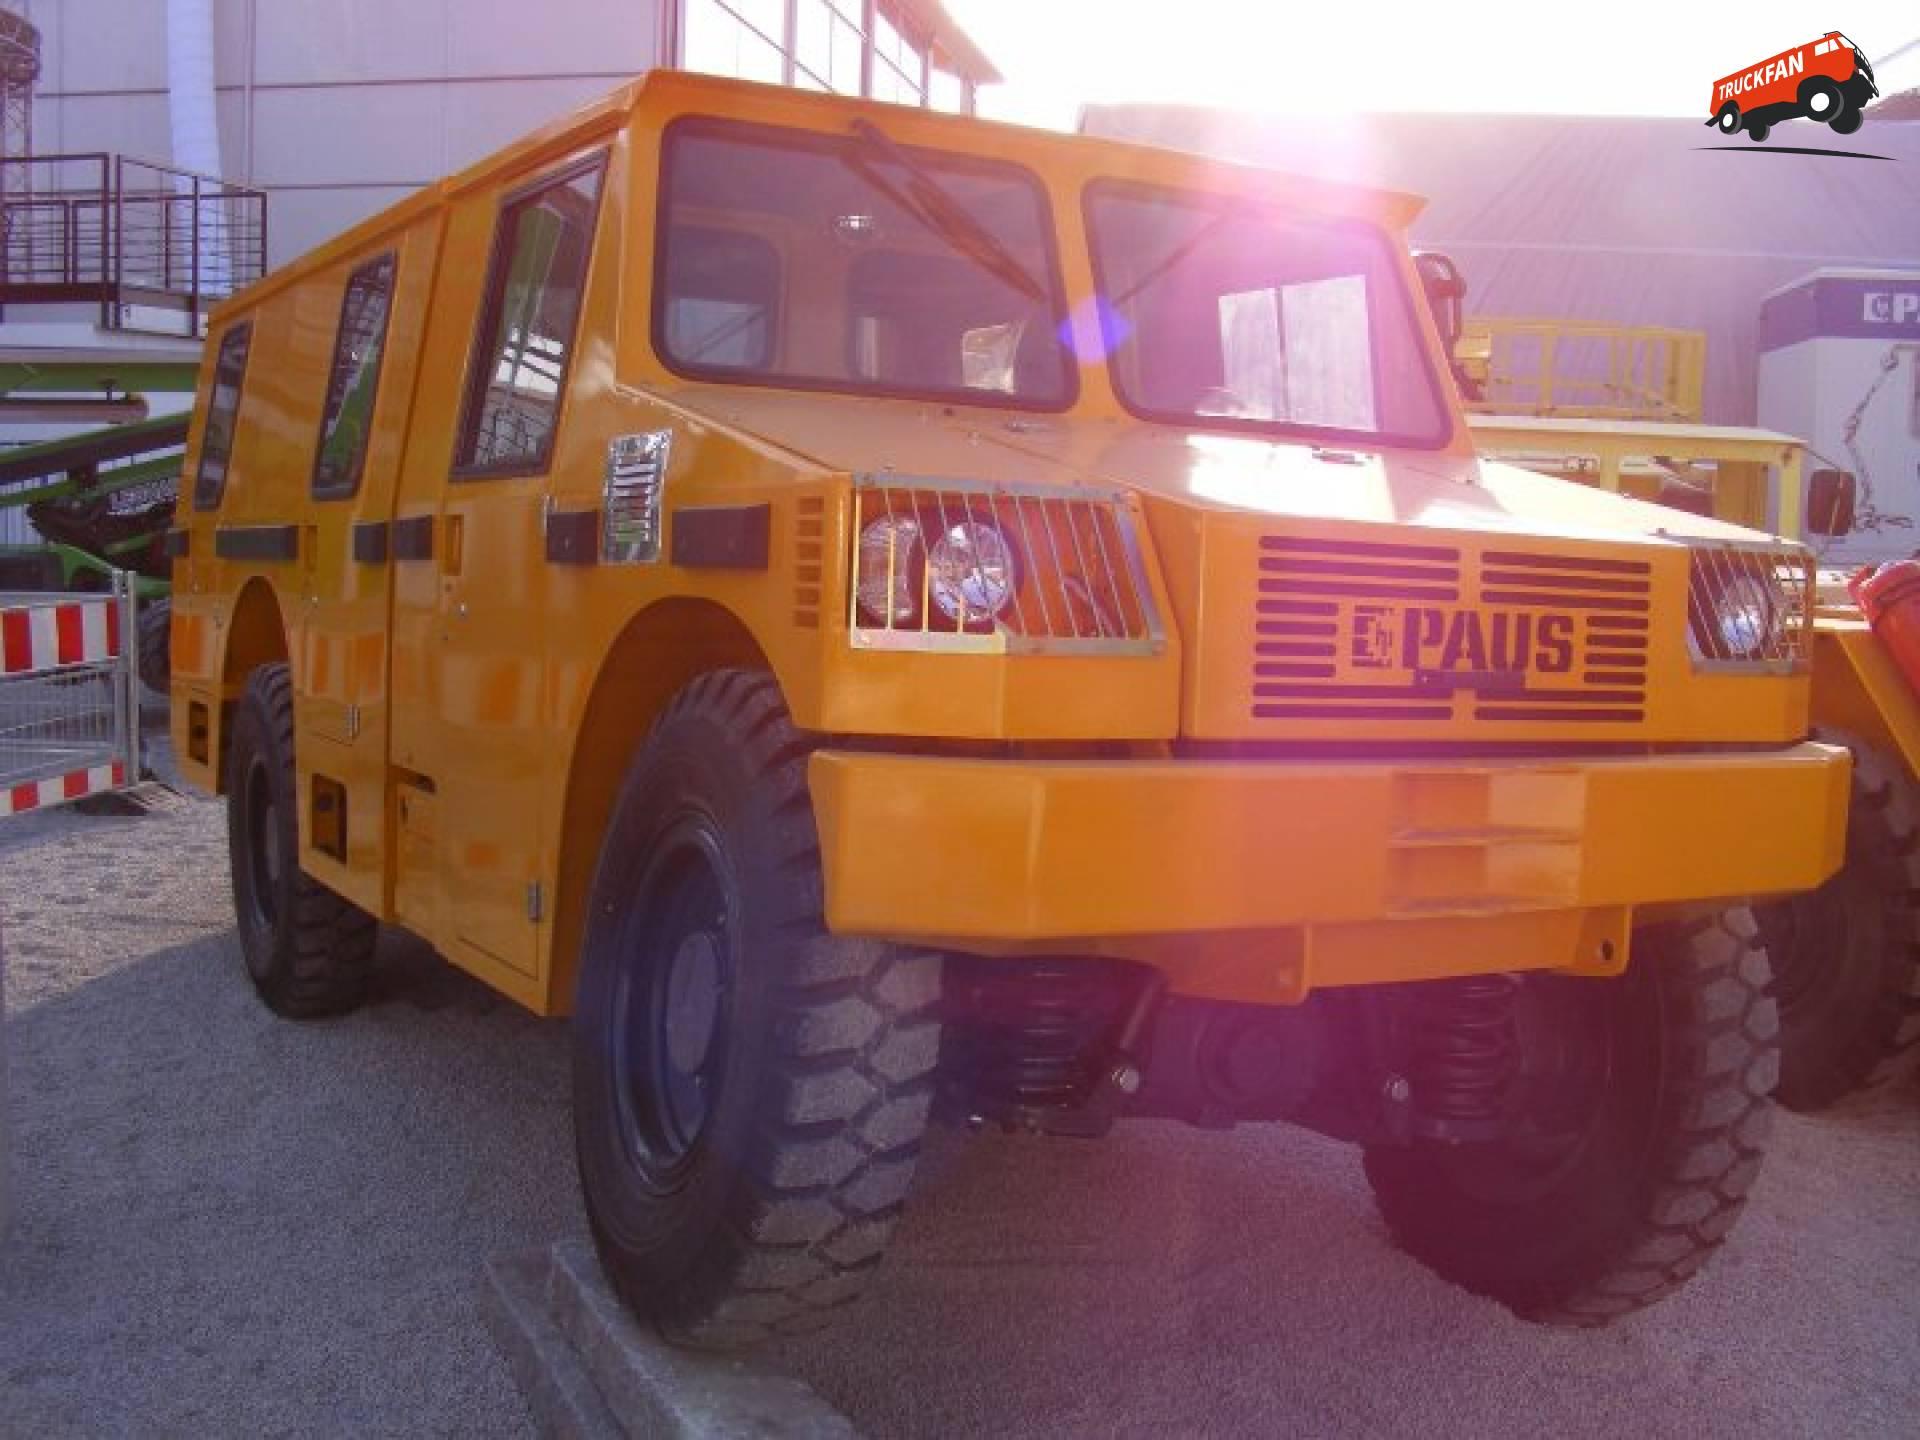 Paus pantserwagen